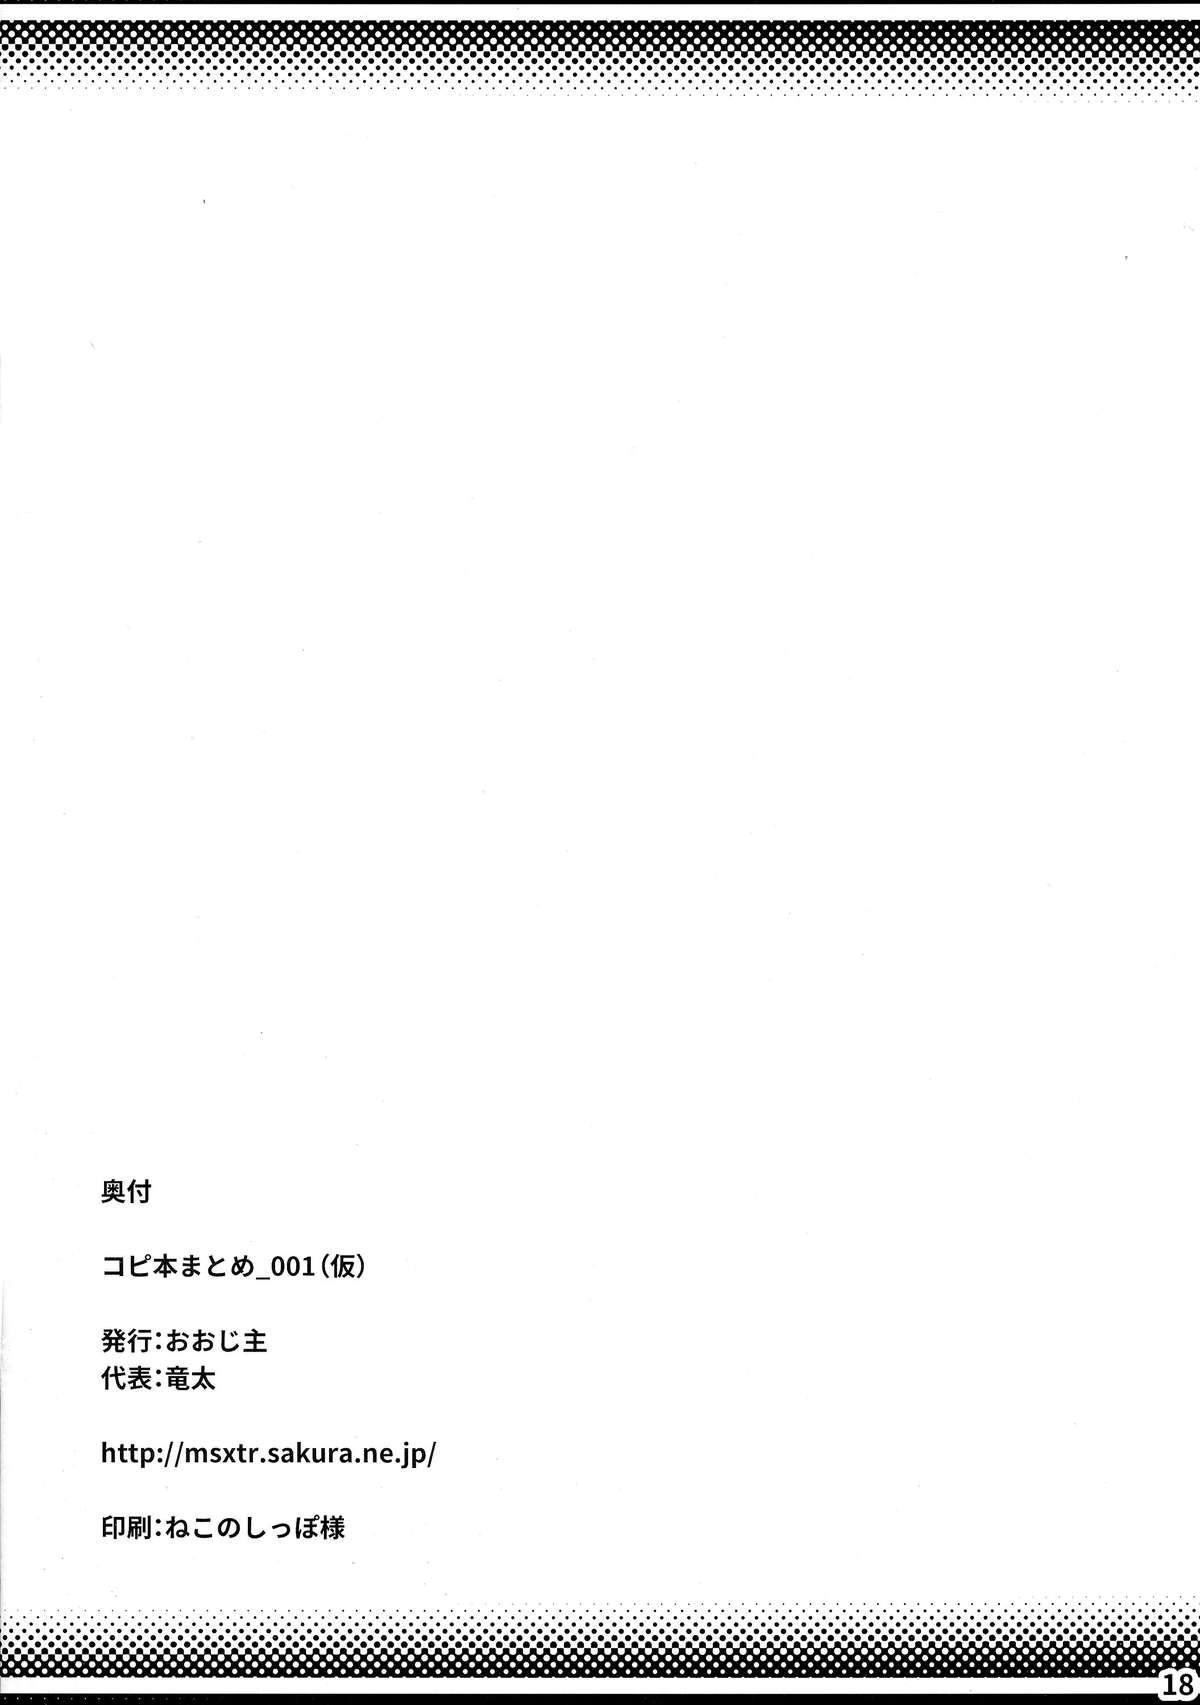 Copy Hon Matome _ 001 18